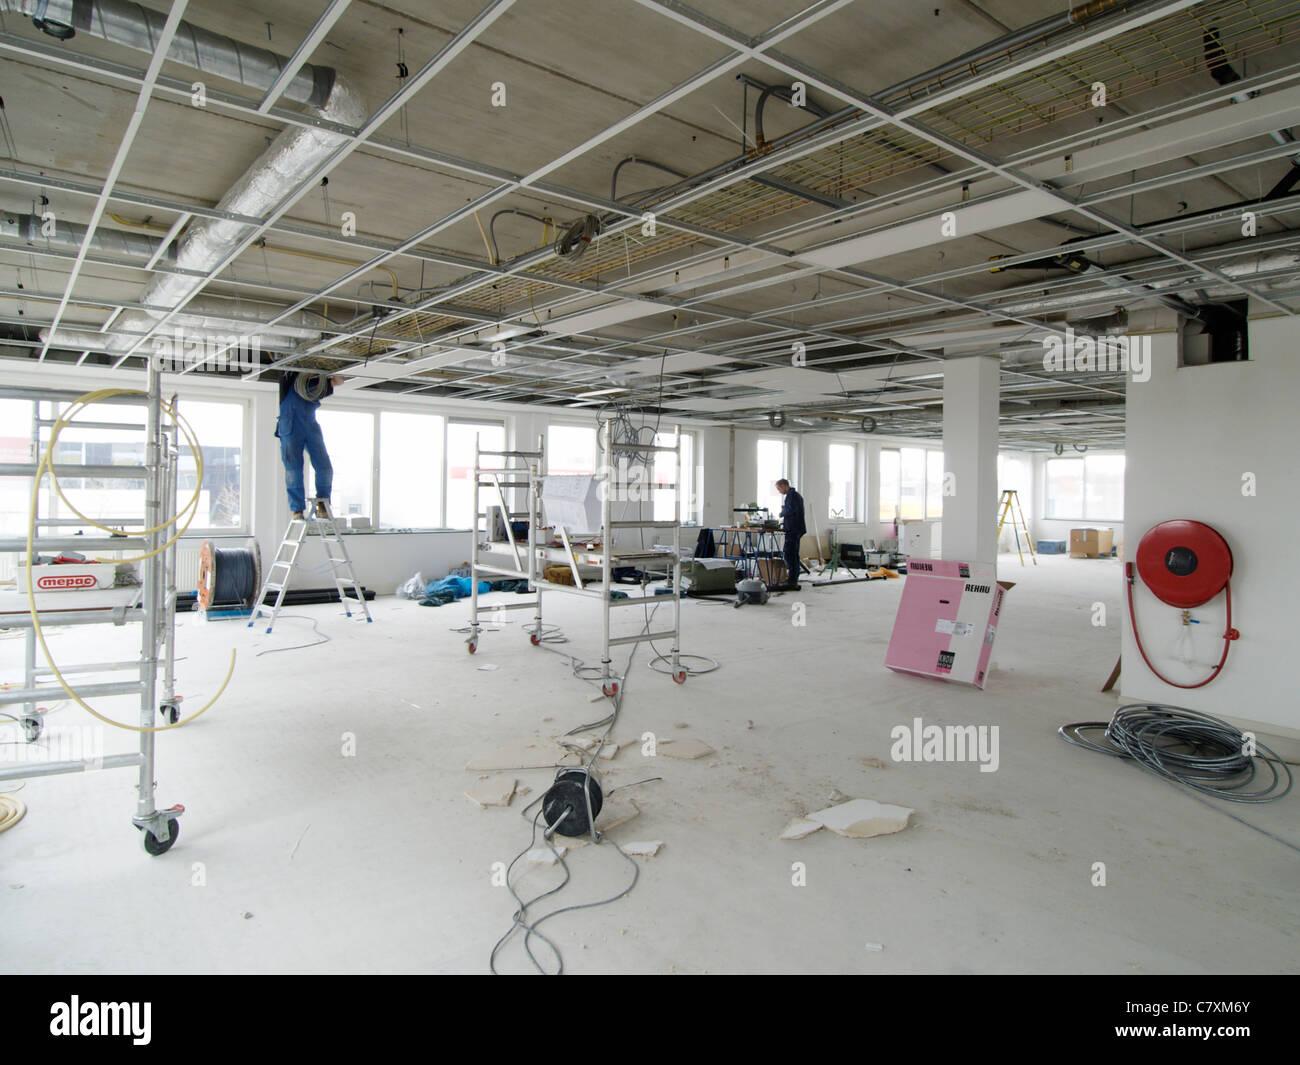 Interior Office Building Under Construction Stock Photos ...